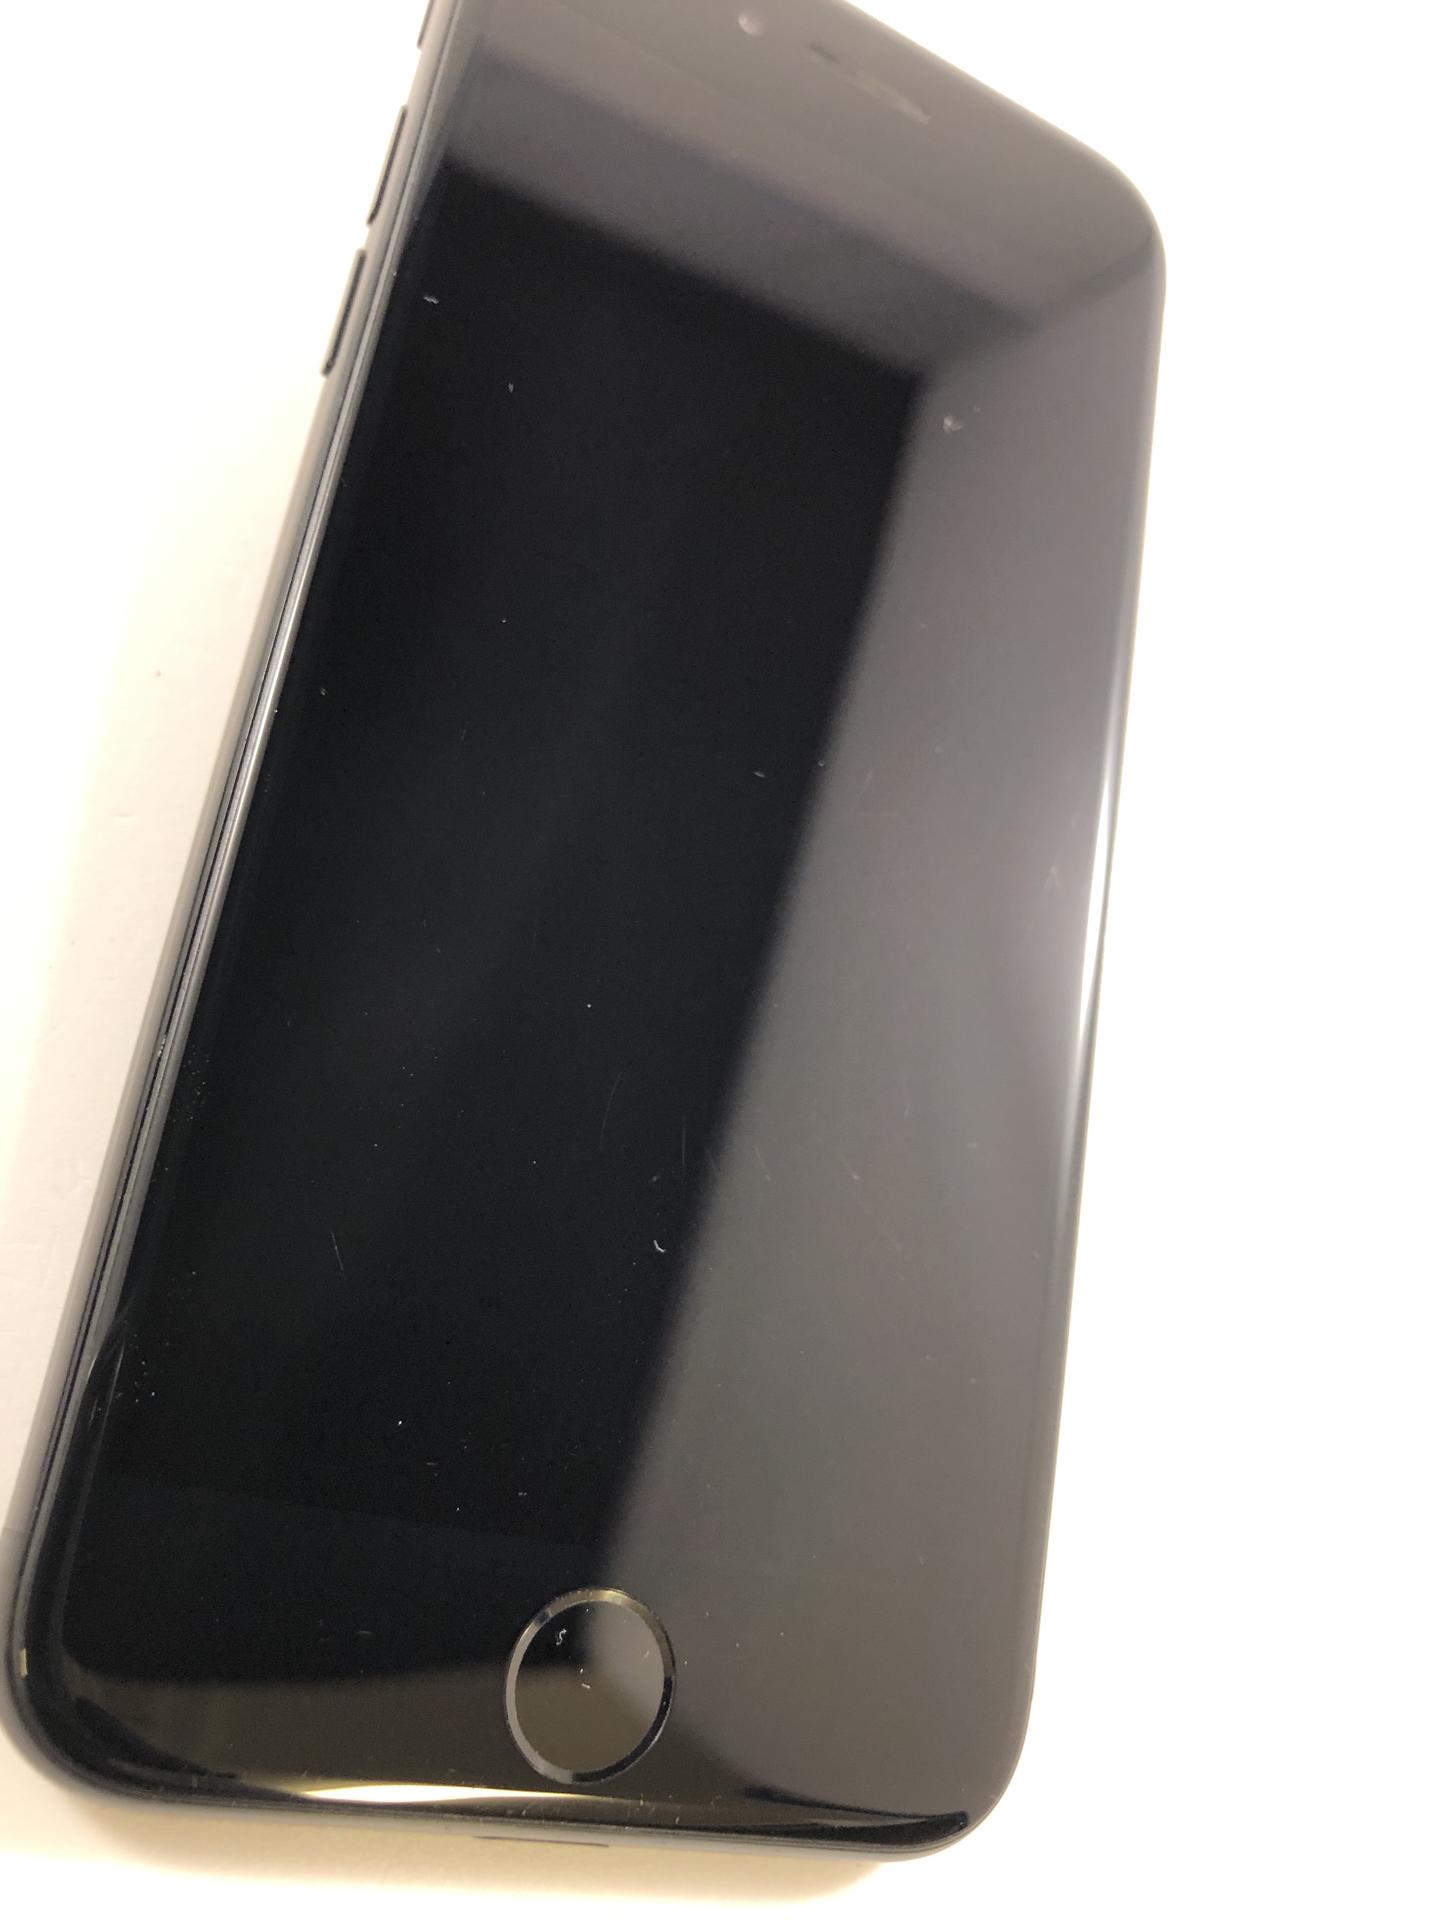 iPhone 7 32GB, 32GB, Jet Black, image 3